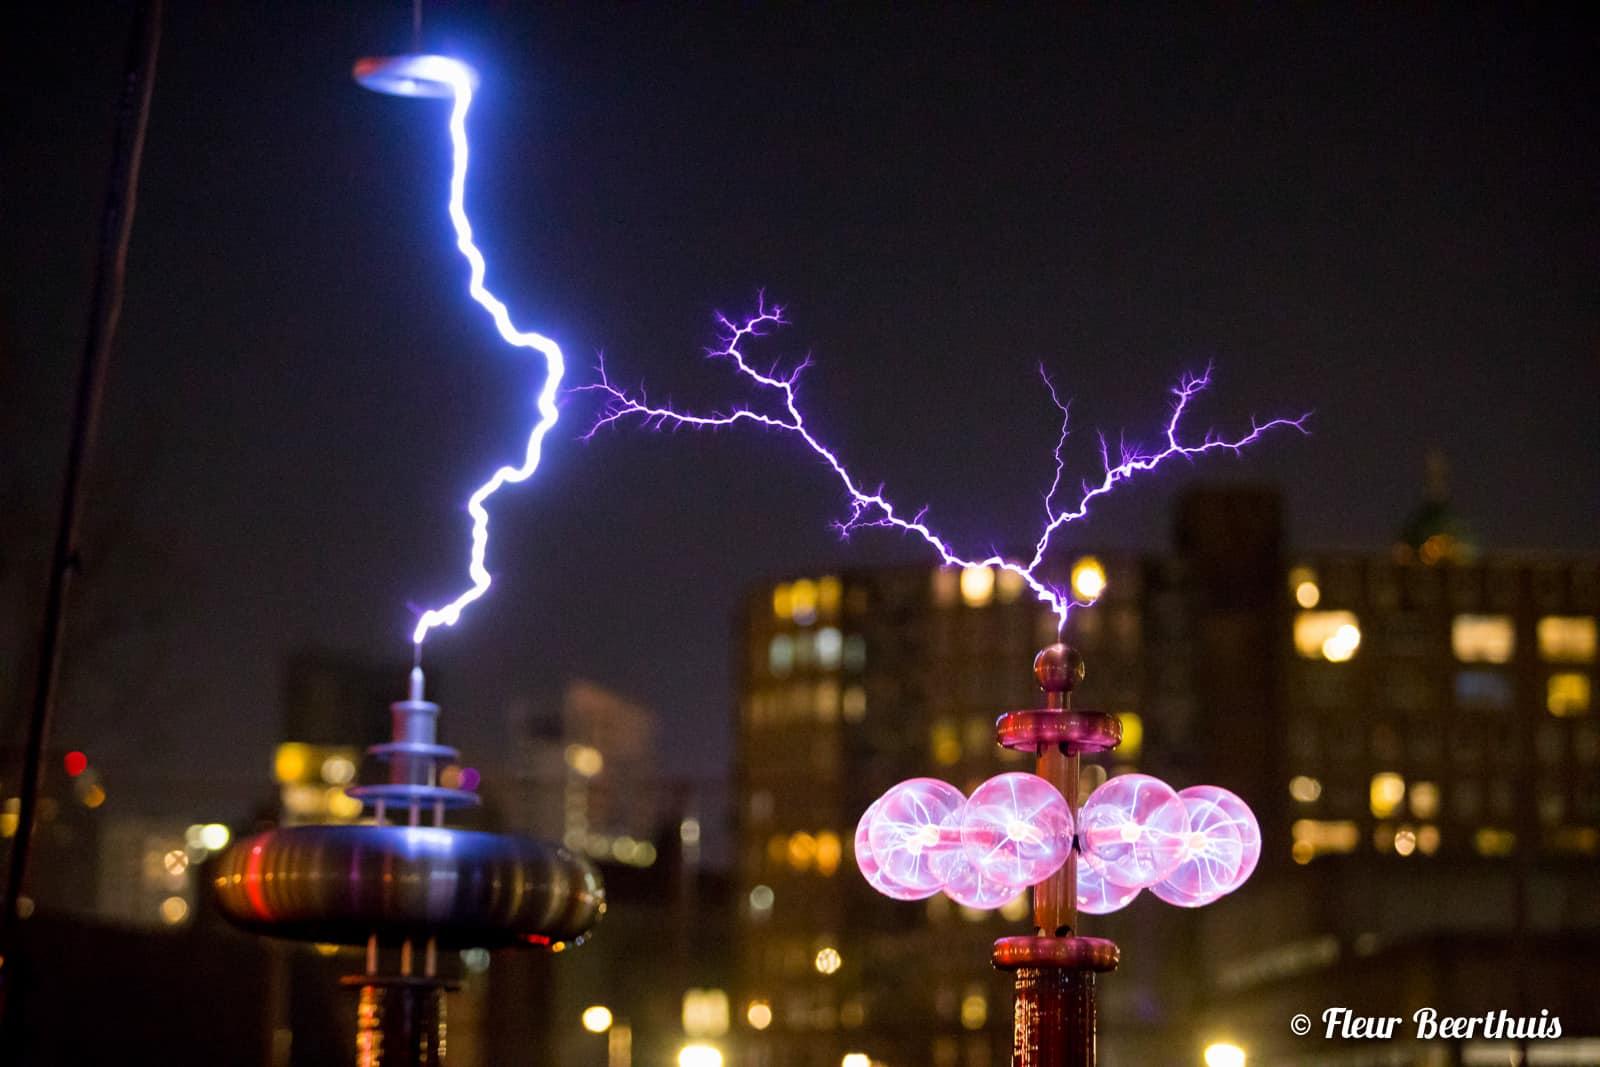 HEADER FOTO - The Symphony of Fire - gespot - muziek - installatie - vuur - bliksem - melodie - kunst